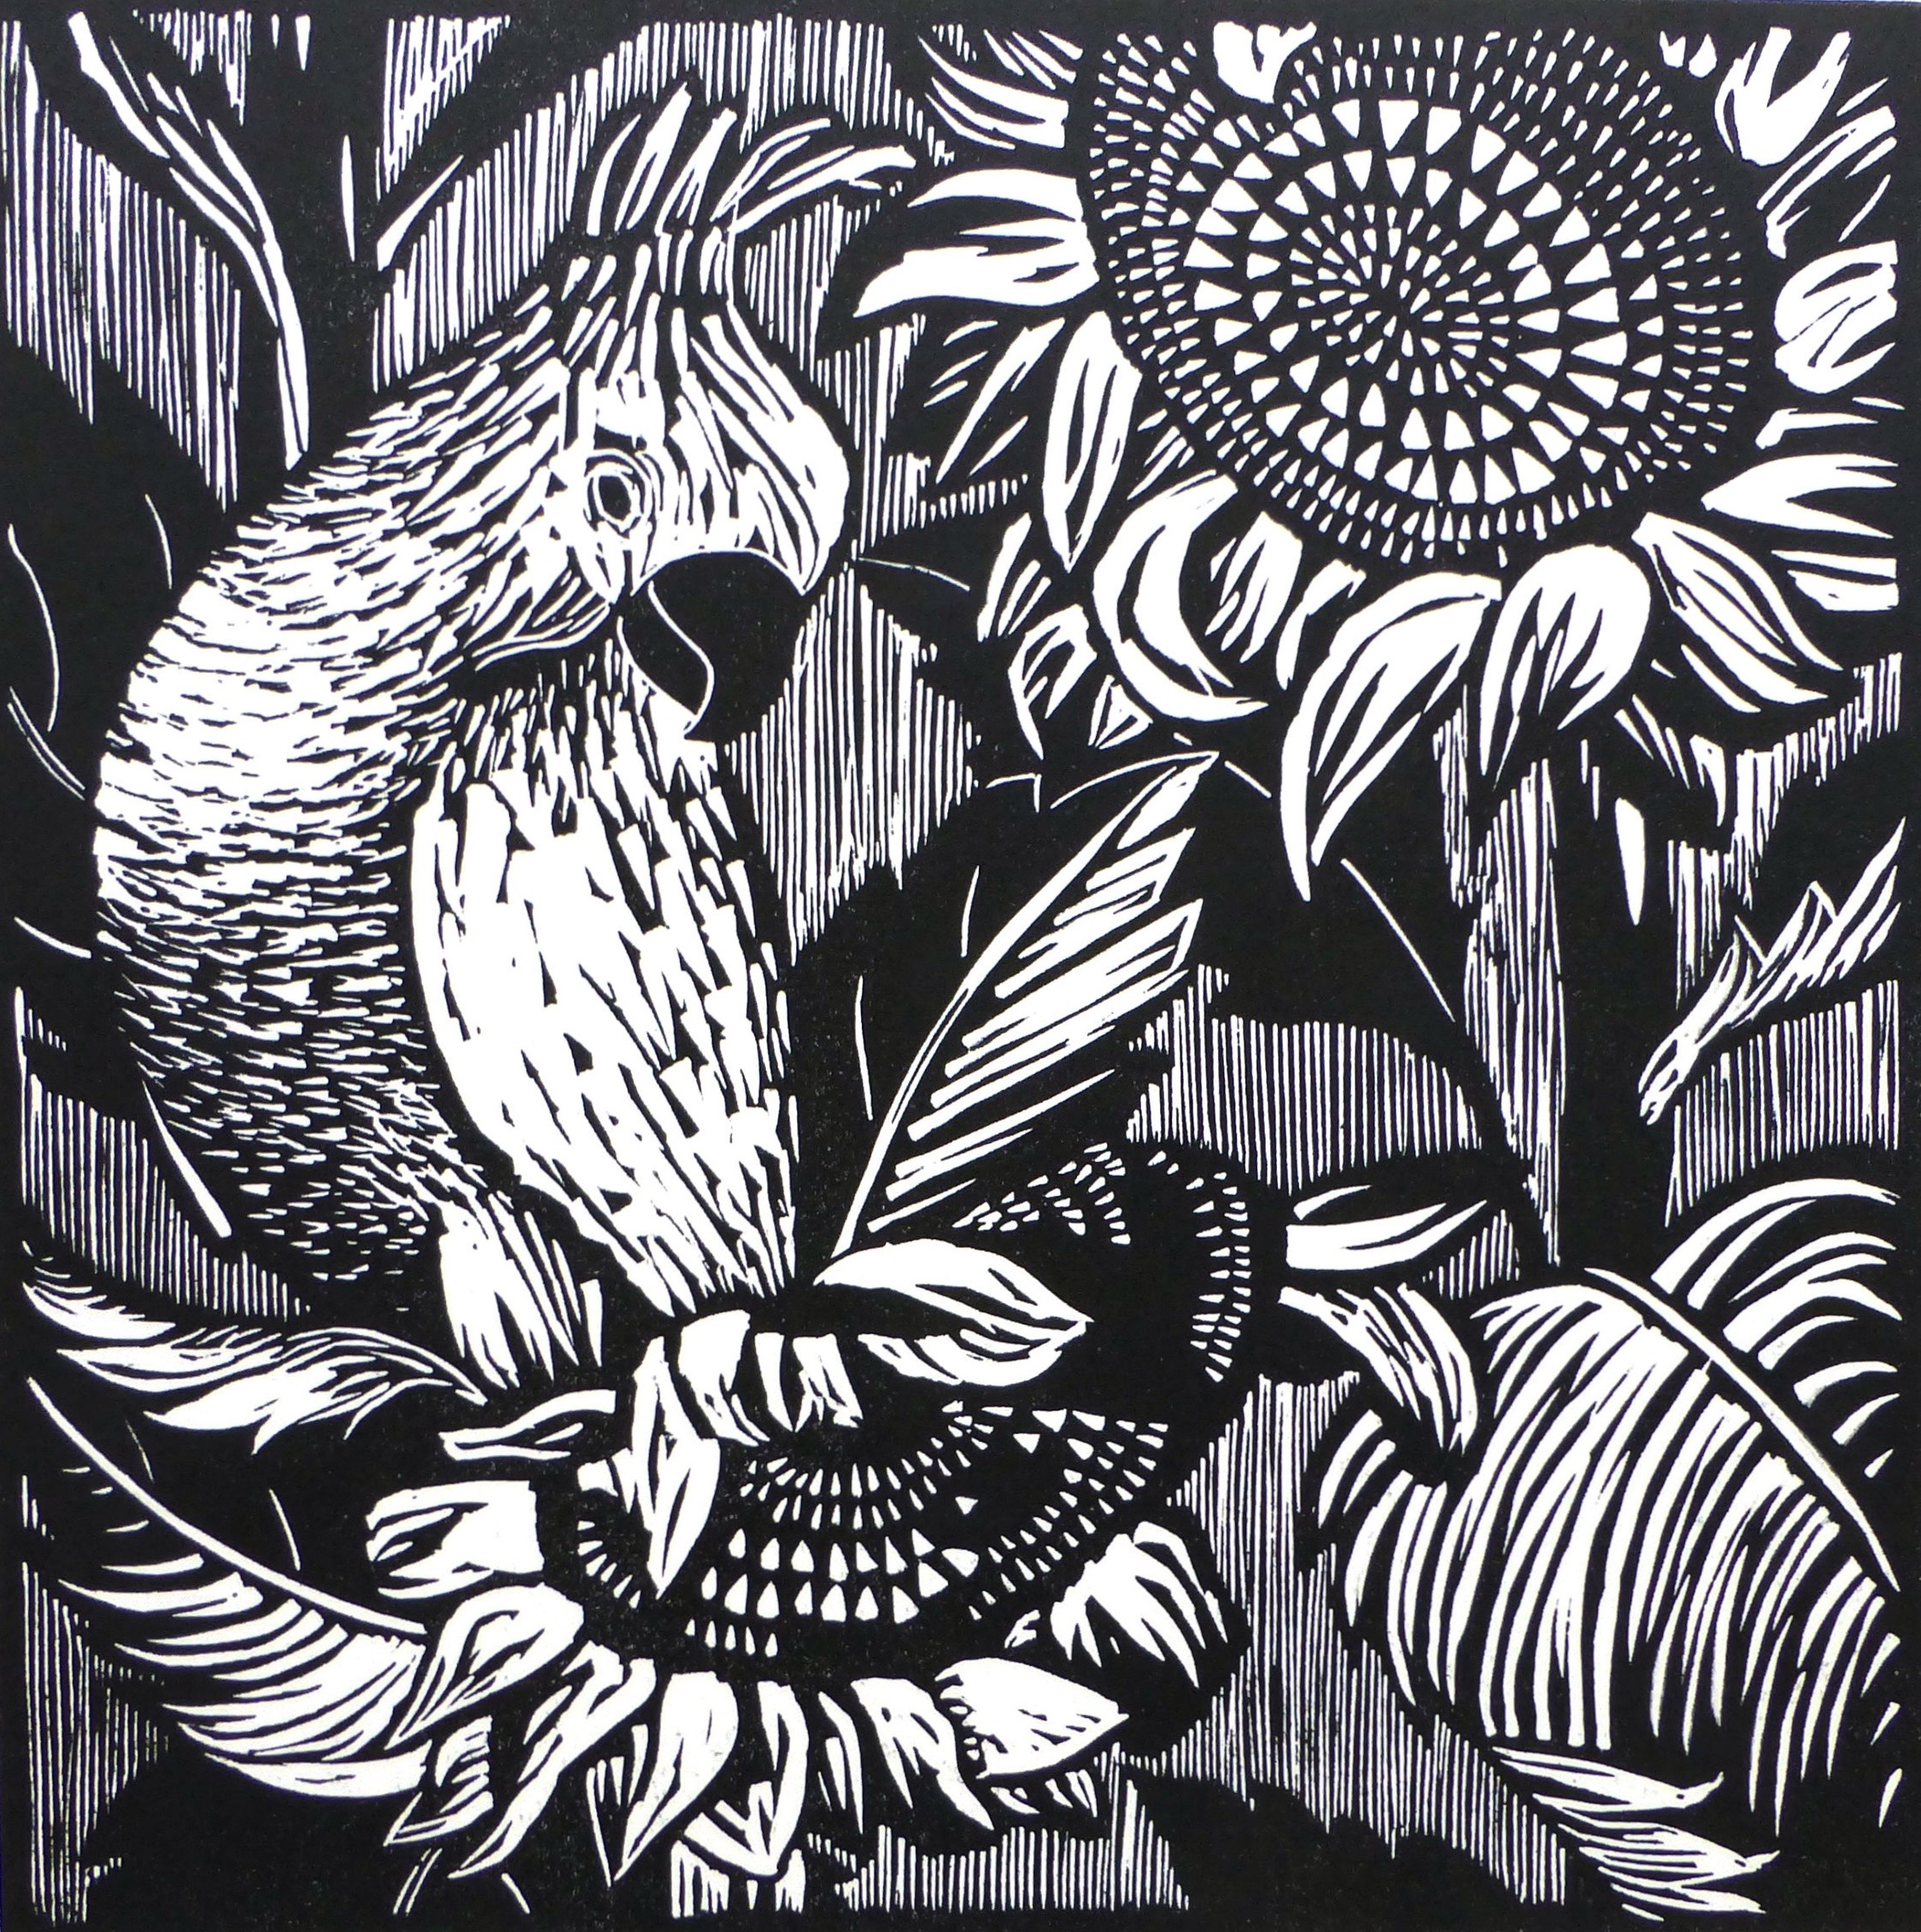 Cockatoo II   Linocut, 2016  Edition of 4  Image size: 20 cm x 20 cm  Paper size: 28.5 cm x 36.5 cm  $70